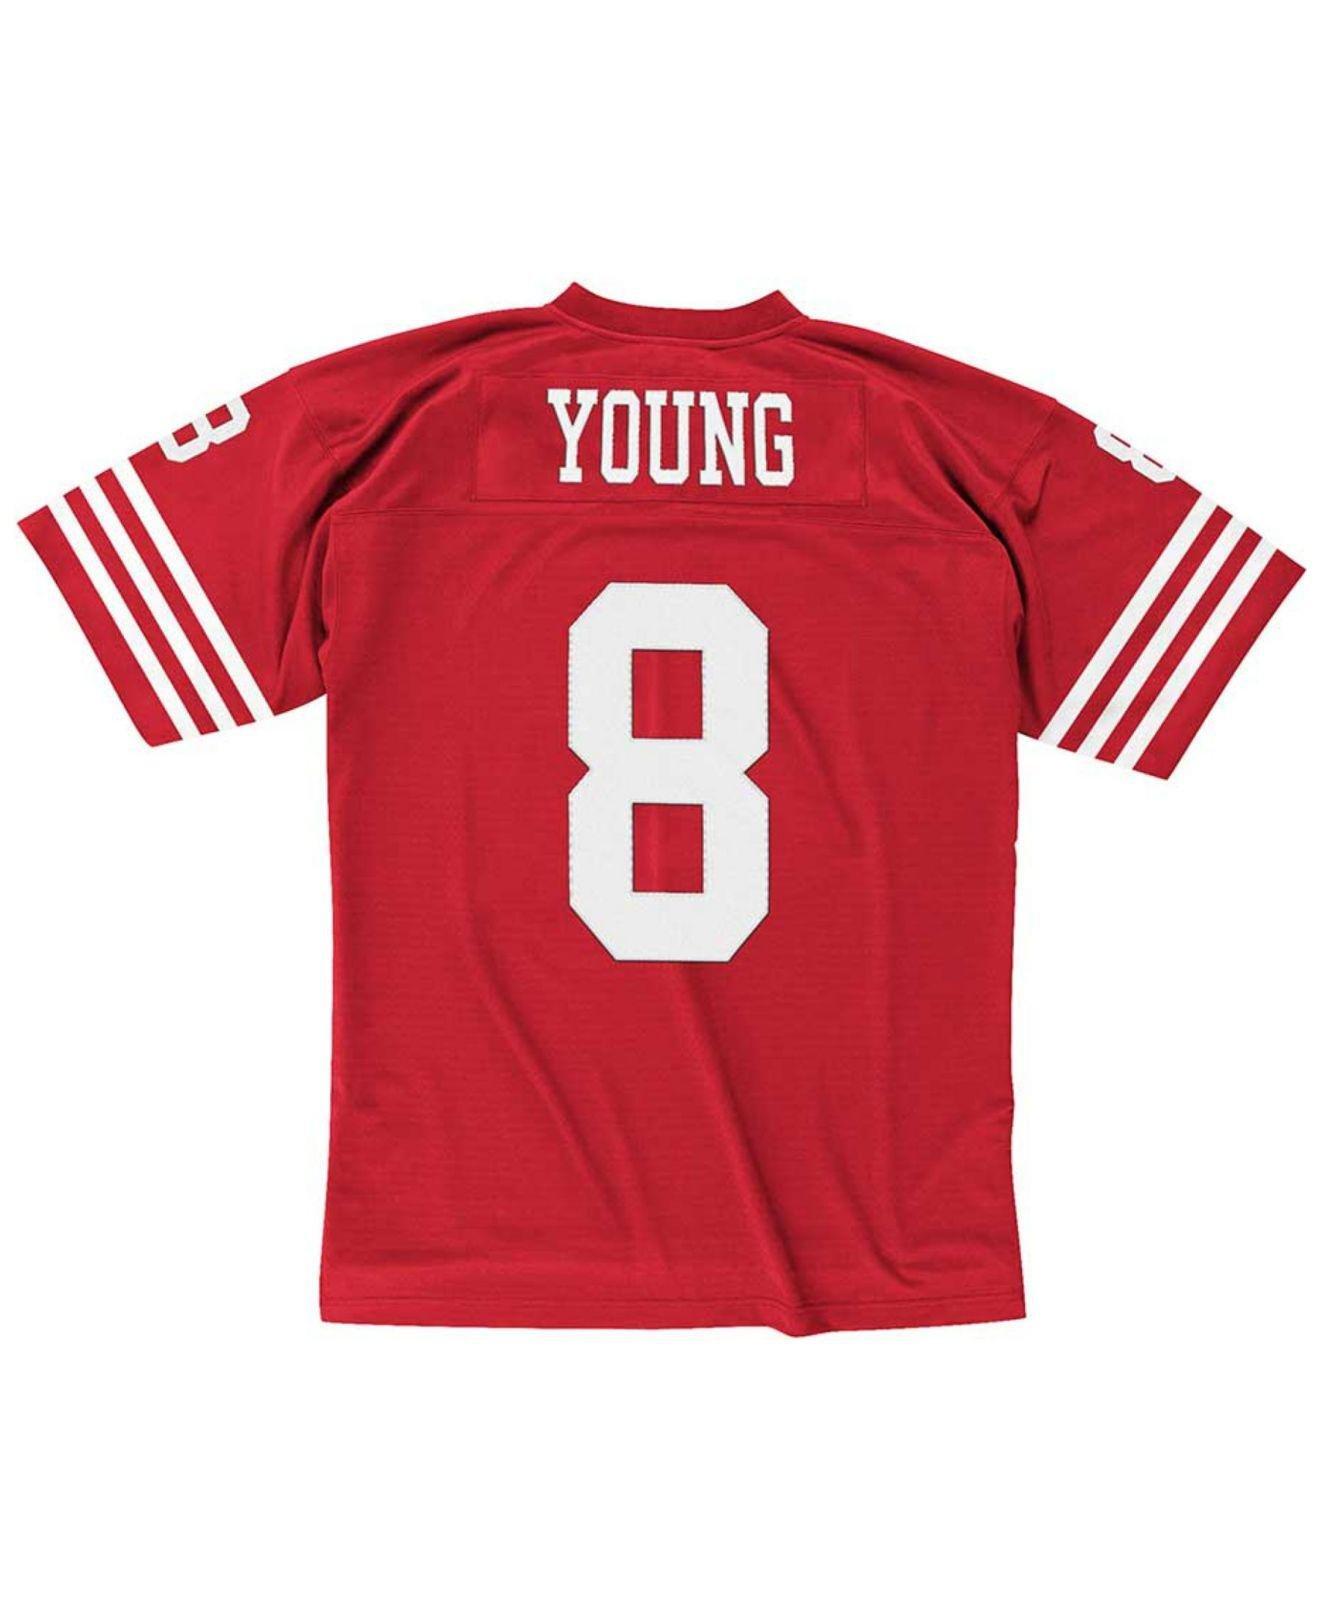 6c22b7c5d Lyst - Mitchell   Ness Steve Young San Francisco 49ers Replica ...